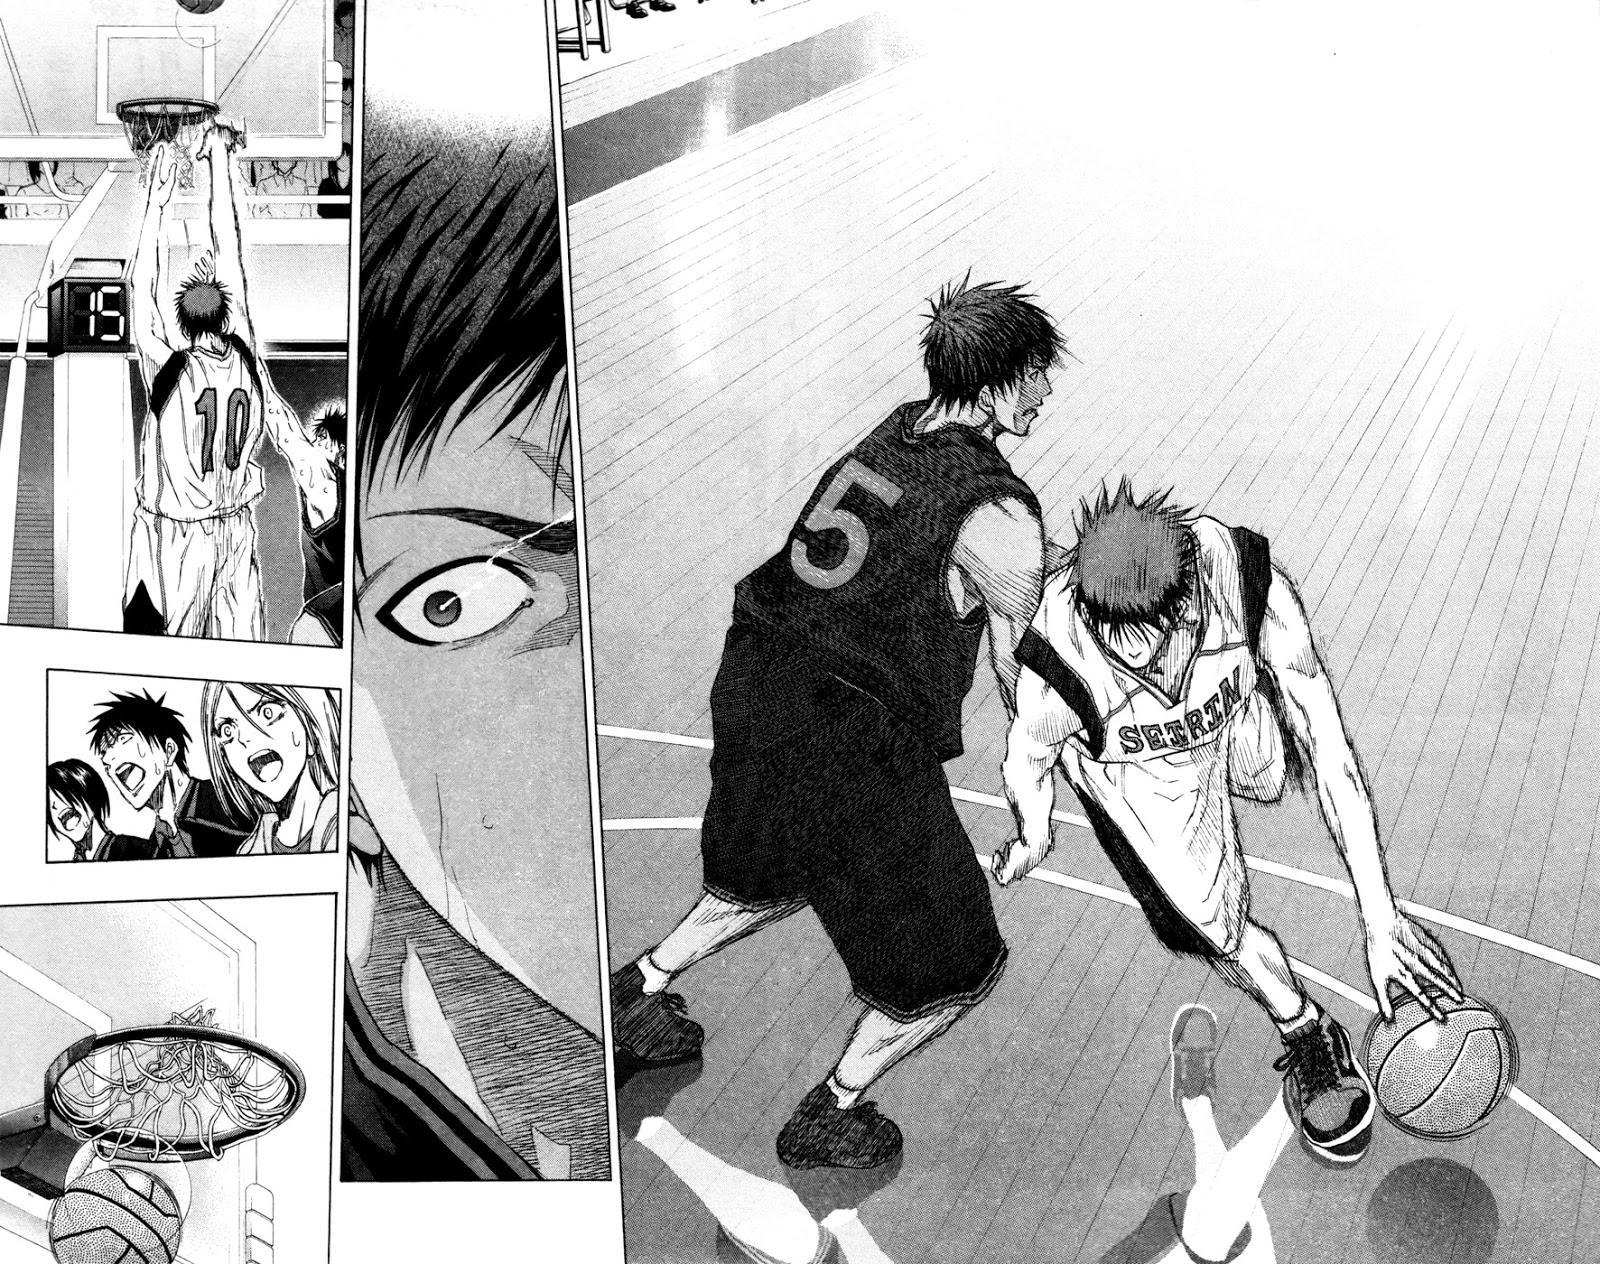 Kuroko no Basket Manga Chapter 136 - Image 16-17